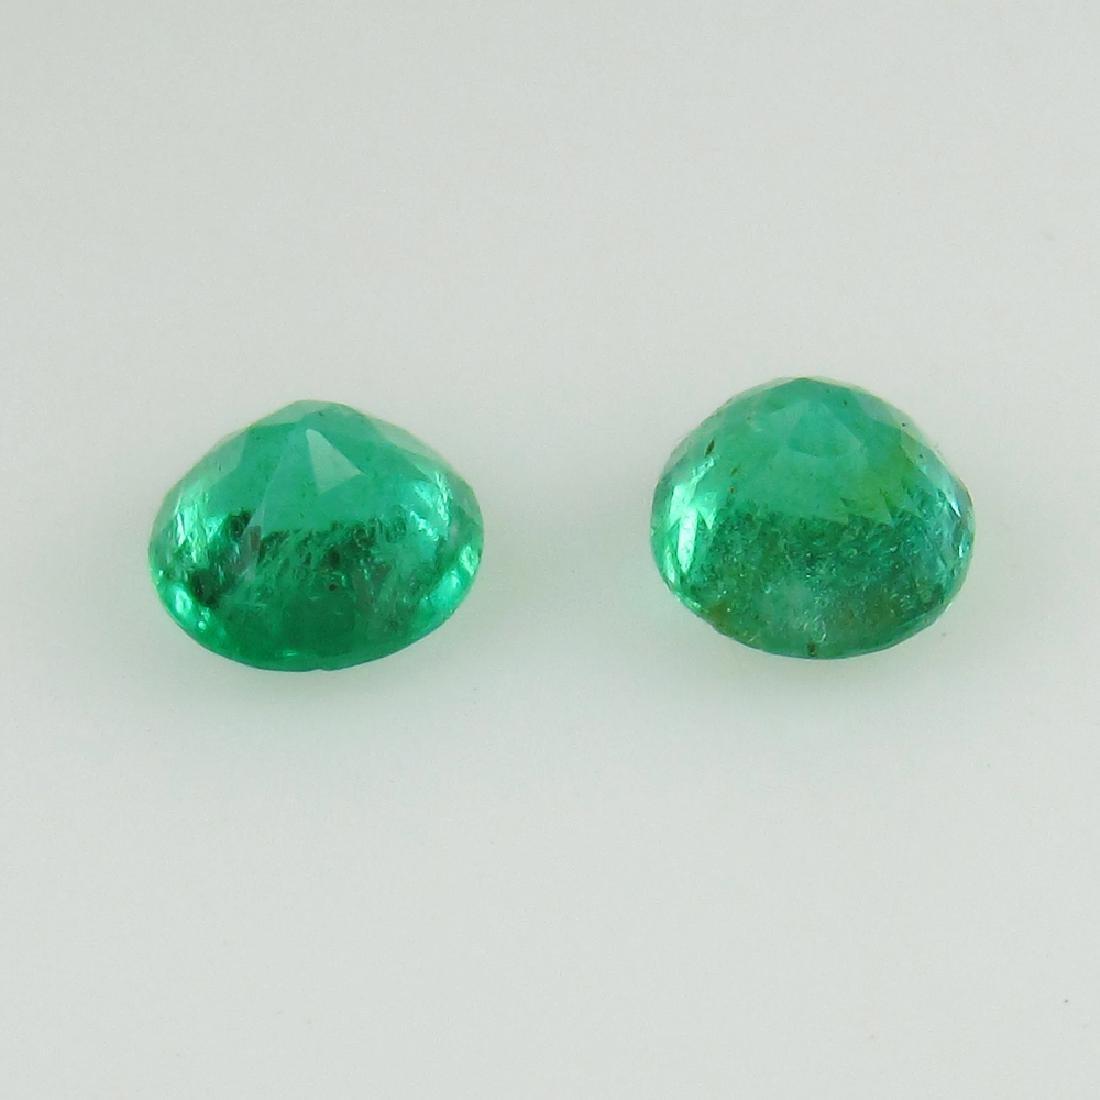 0.58 Ct Genuine Loose Zambian Emerald 4.2 mm Round Pair - 2